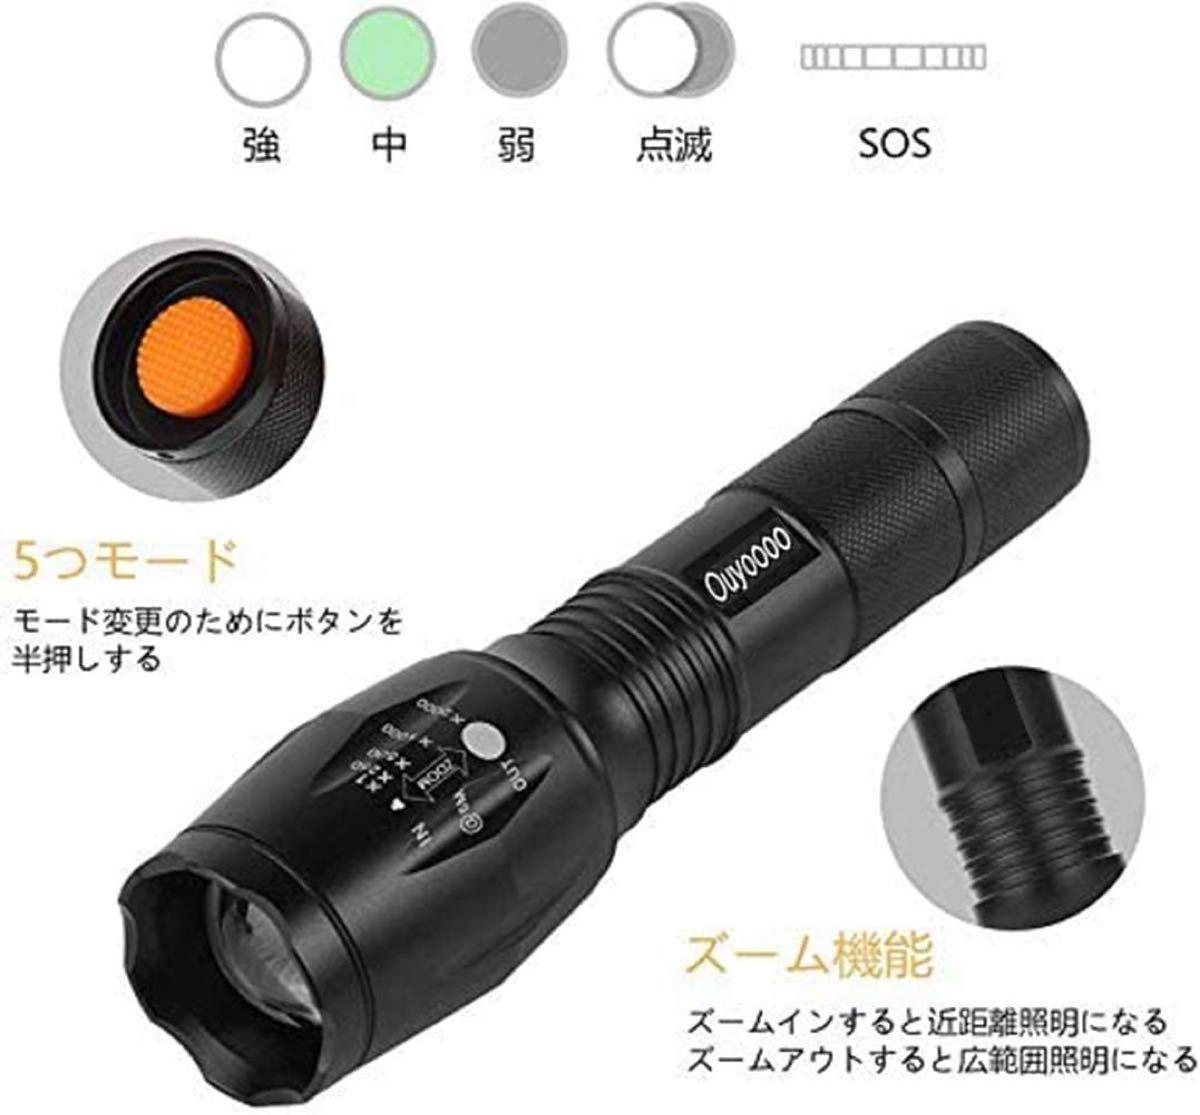 LED懐中電灯 強力超高輝度1600ルーメントーチライト防水ズーム式 五つモード